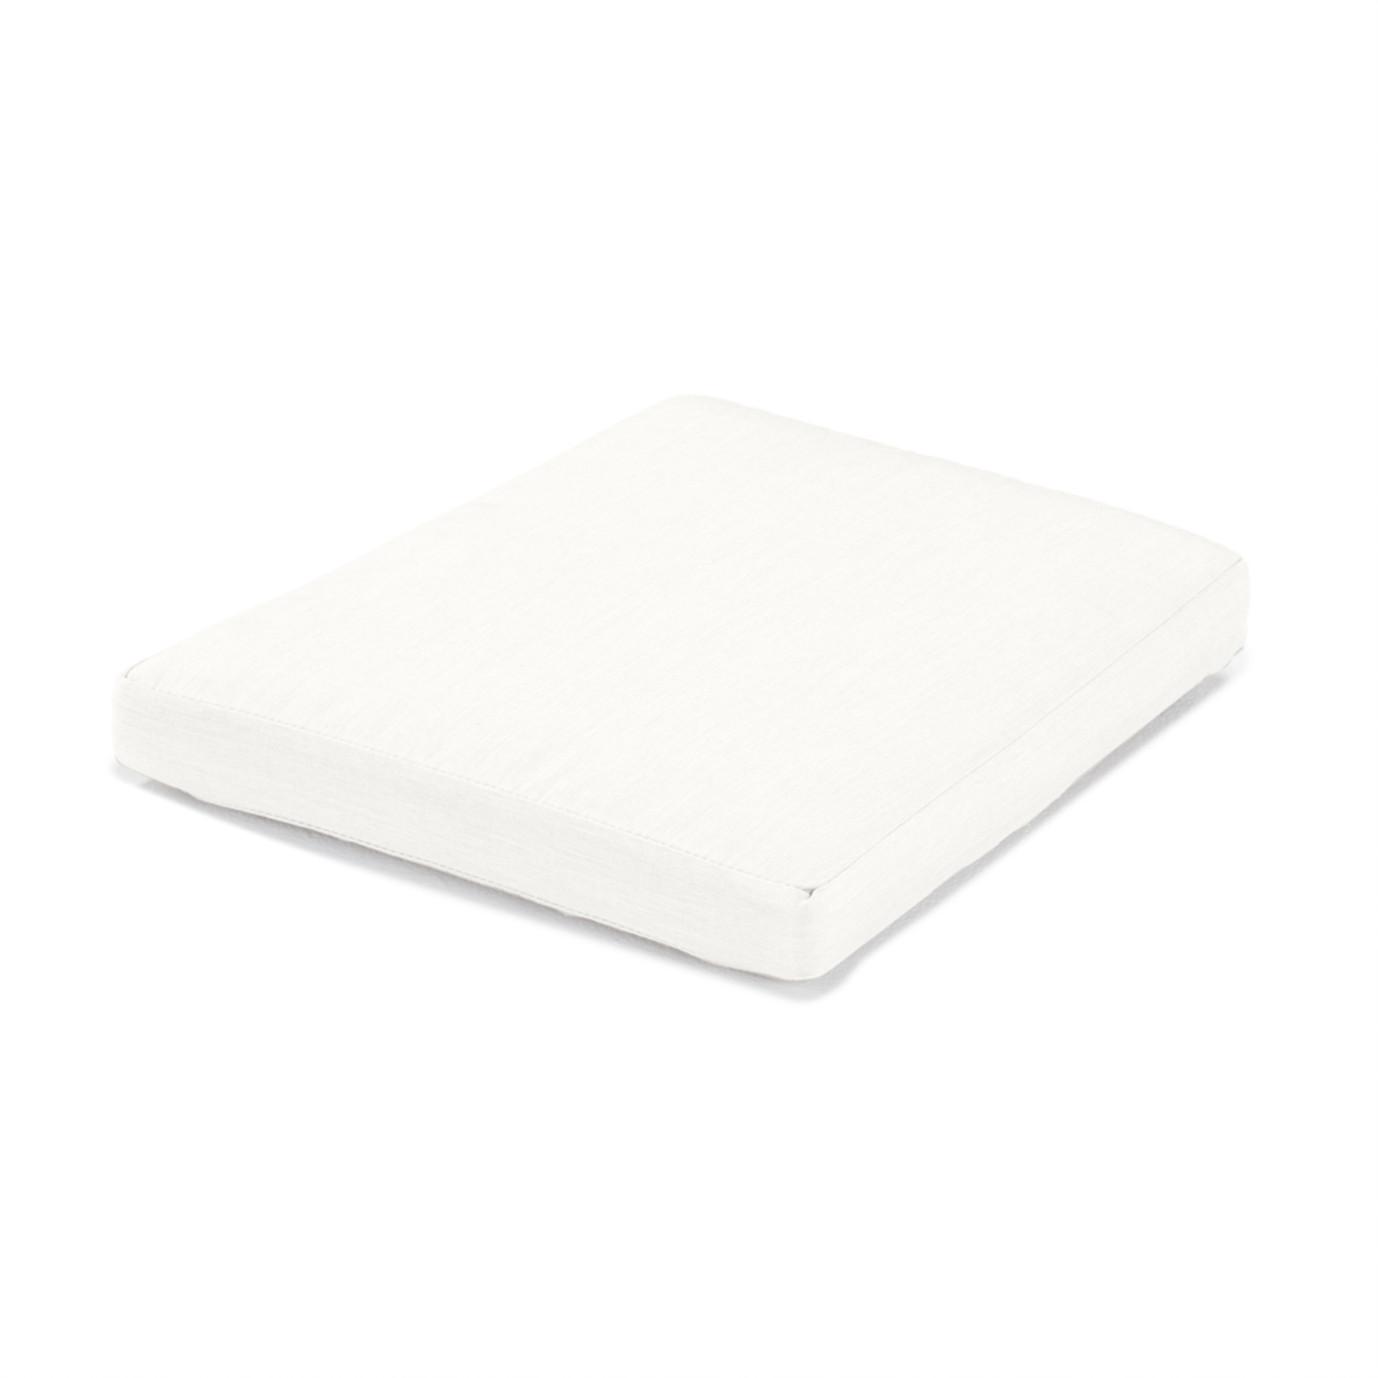 Vistano® Armless Dining Chair Cushion - Flax